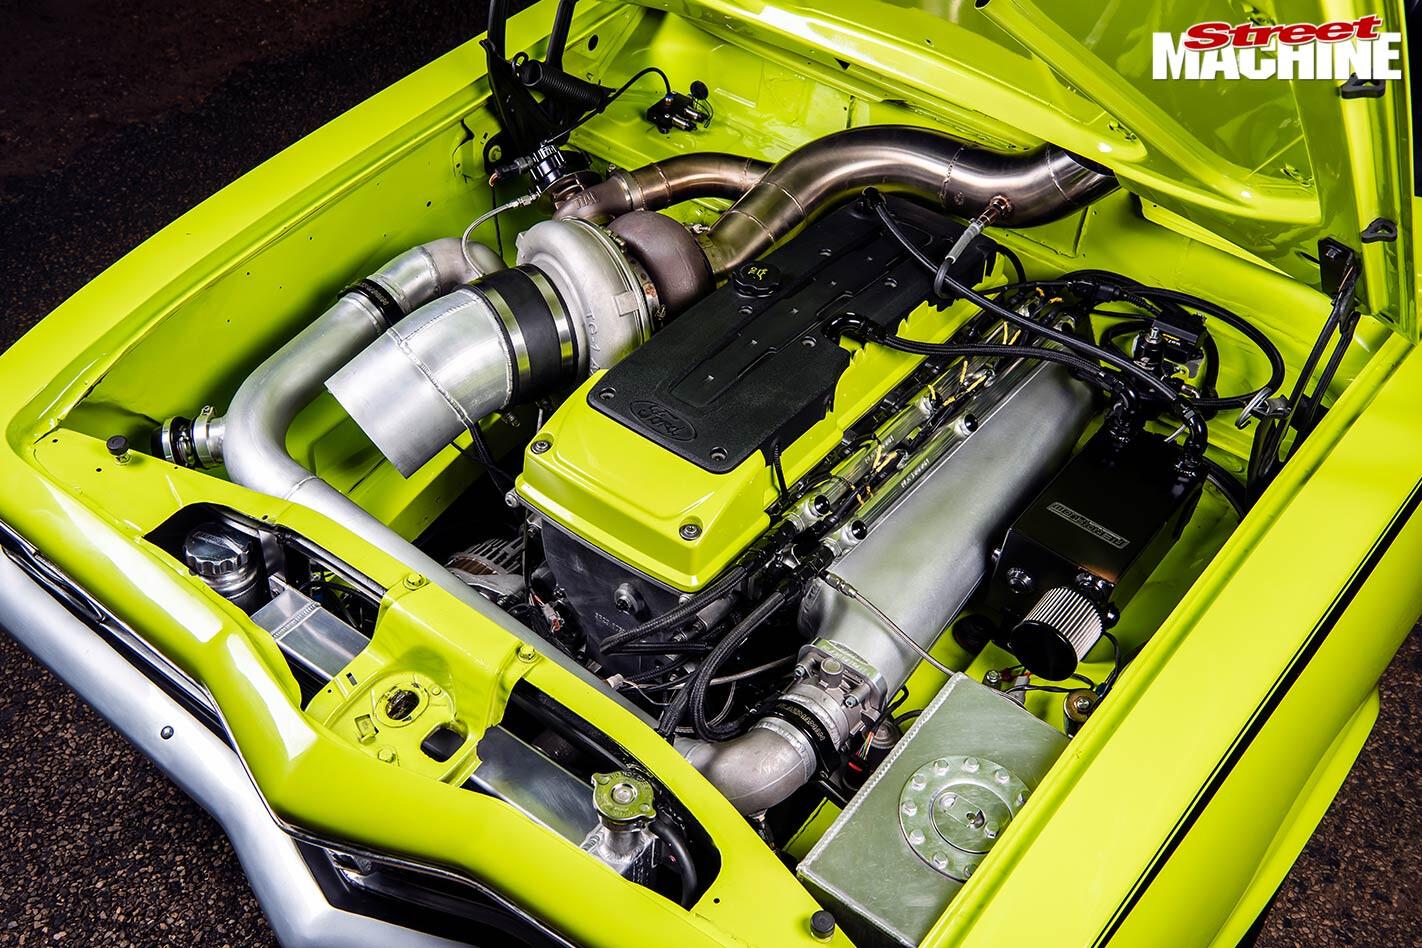 Holden LC Torana engine bay